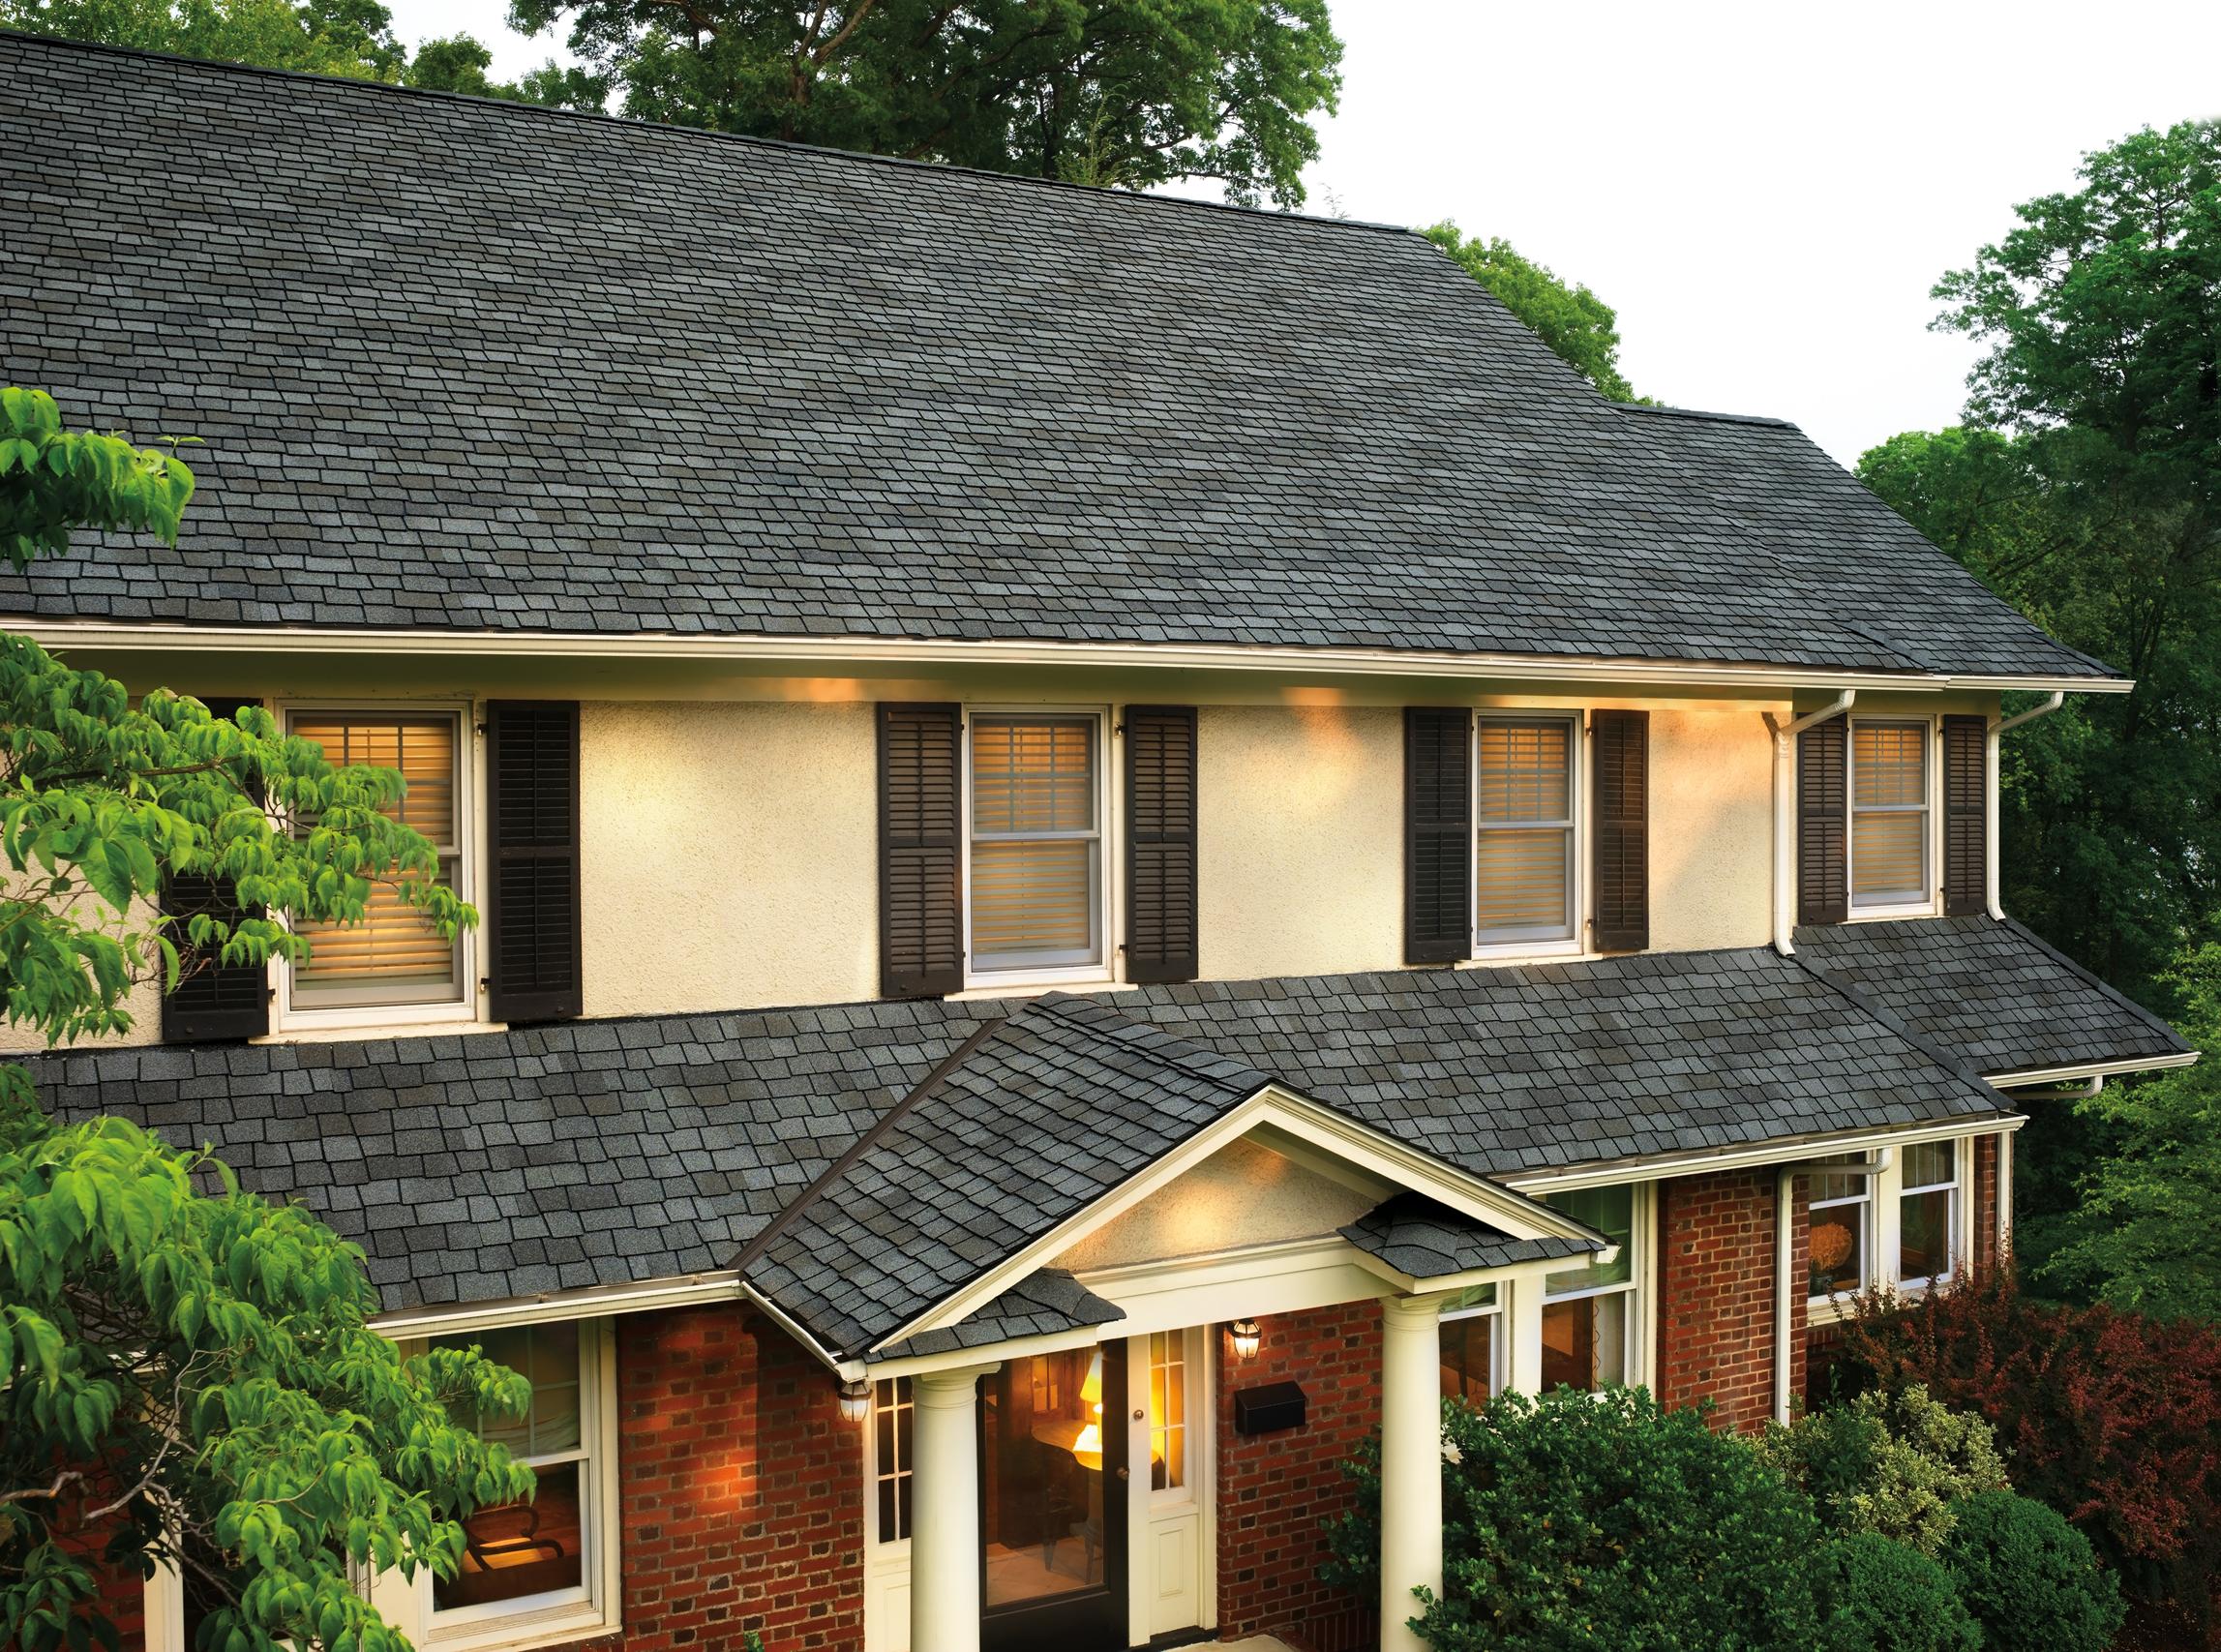 Best Gaf Glenwood Shingles Chelsea Gray Roofing Shingling 400 x 300